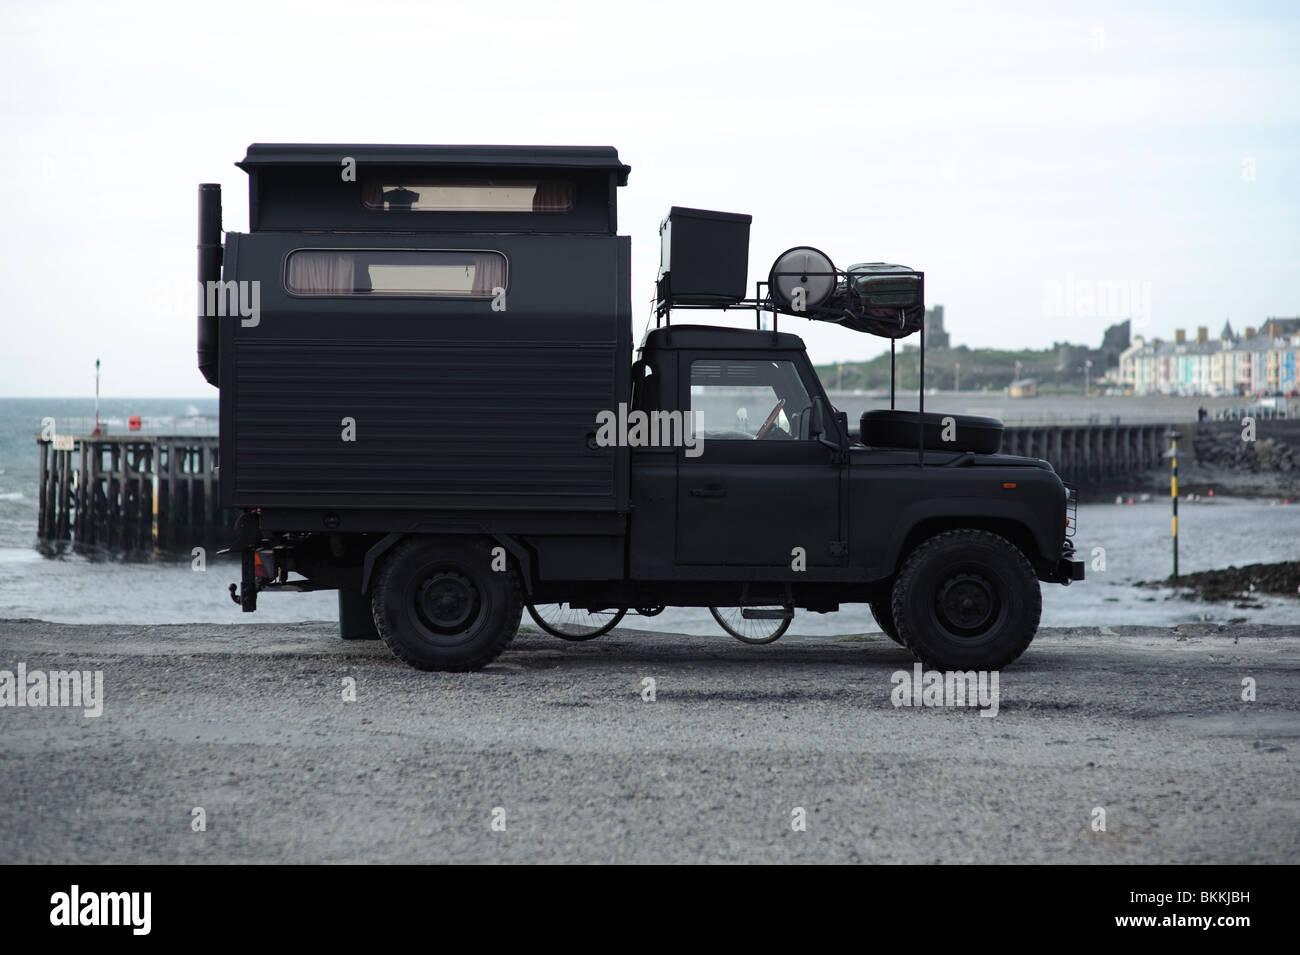 A Landrover Converted Into Mobile Home Camper Van UK